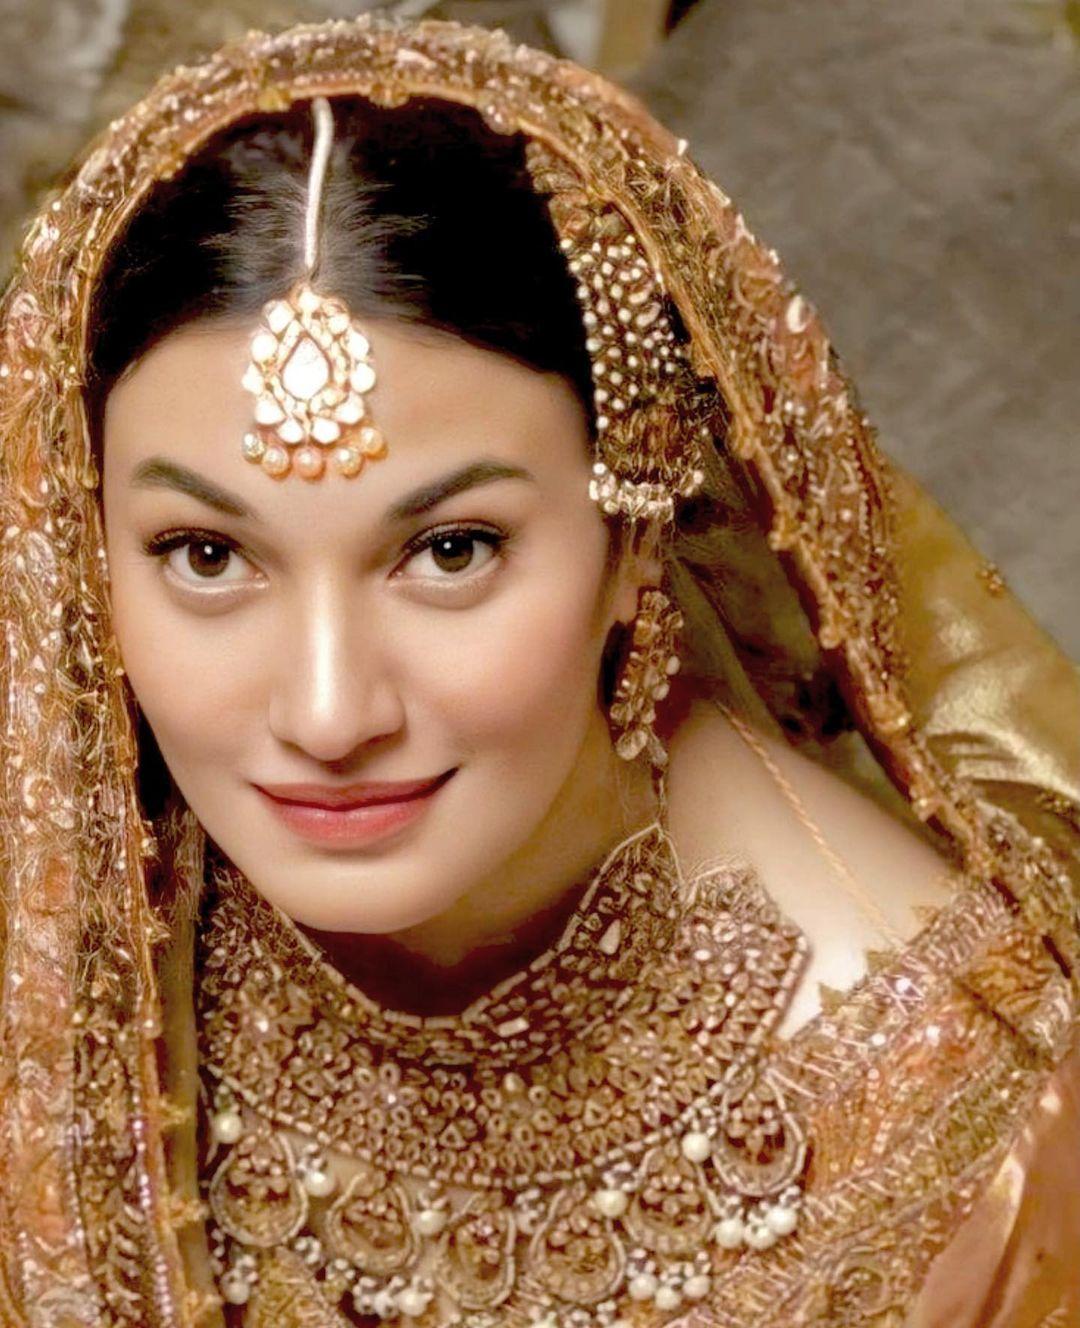 Muniba Mazari looks gorgeous with a bridal dress